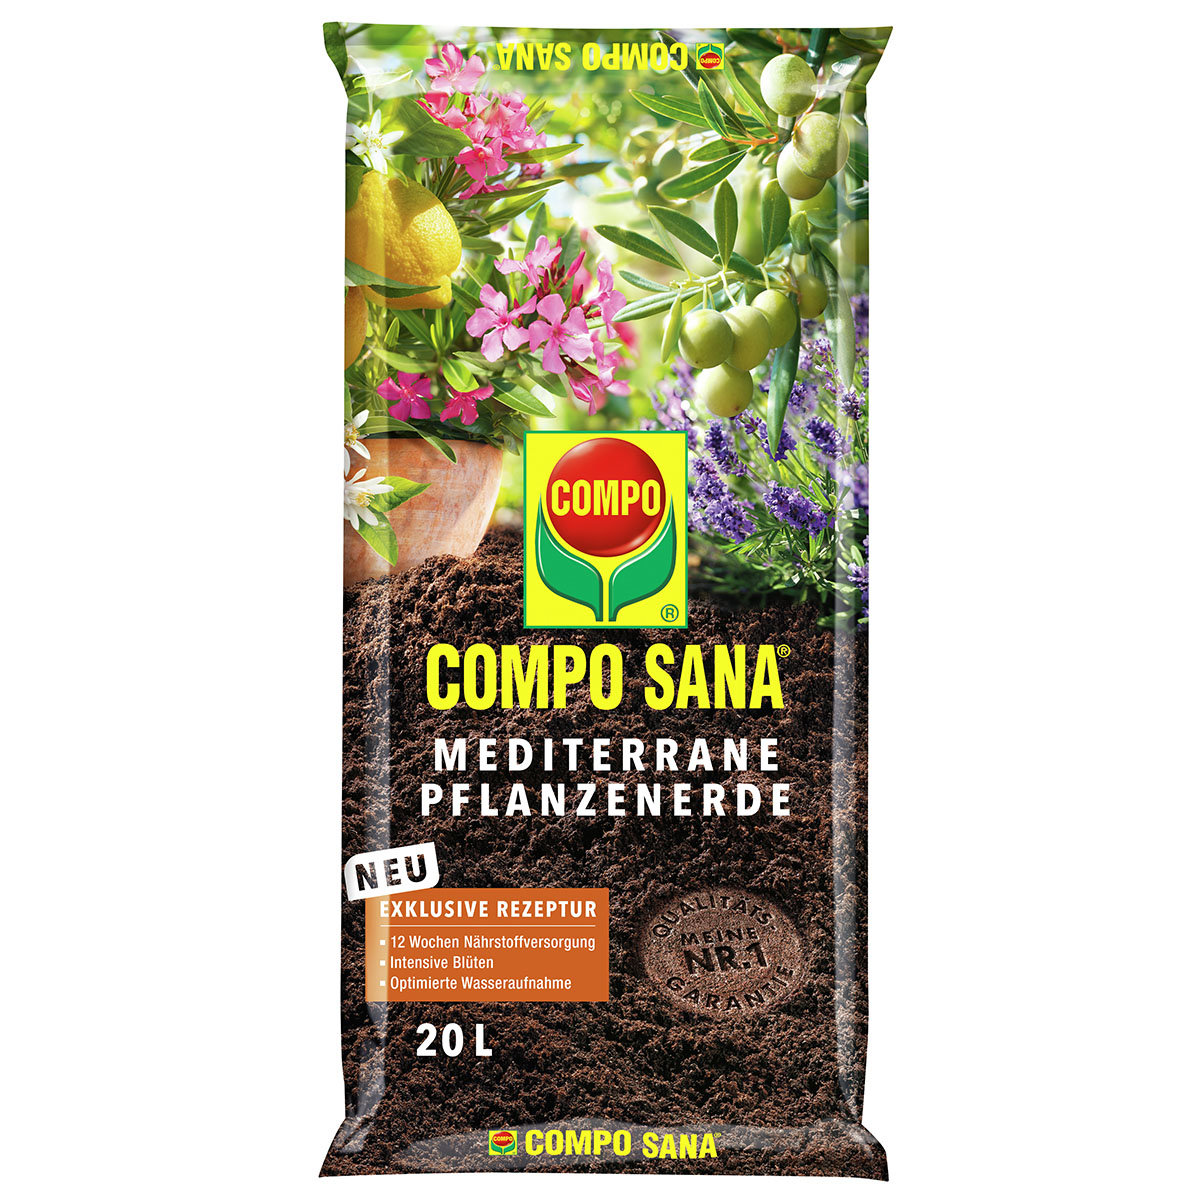 Compo Sana® Mediterrane Pflanzenerde, 20 Liter